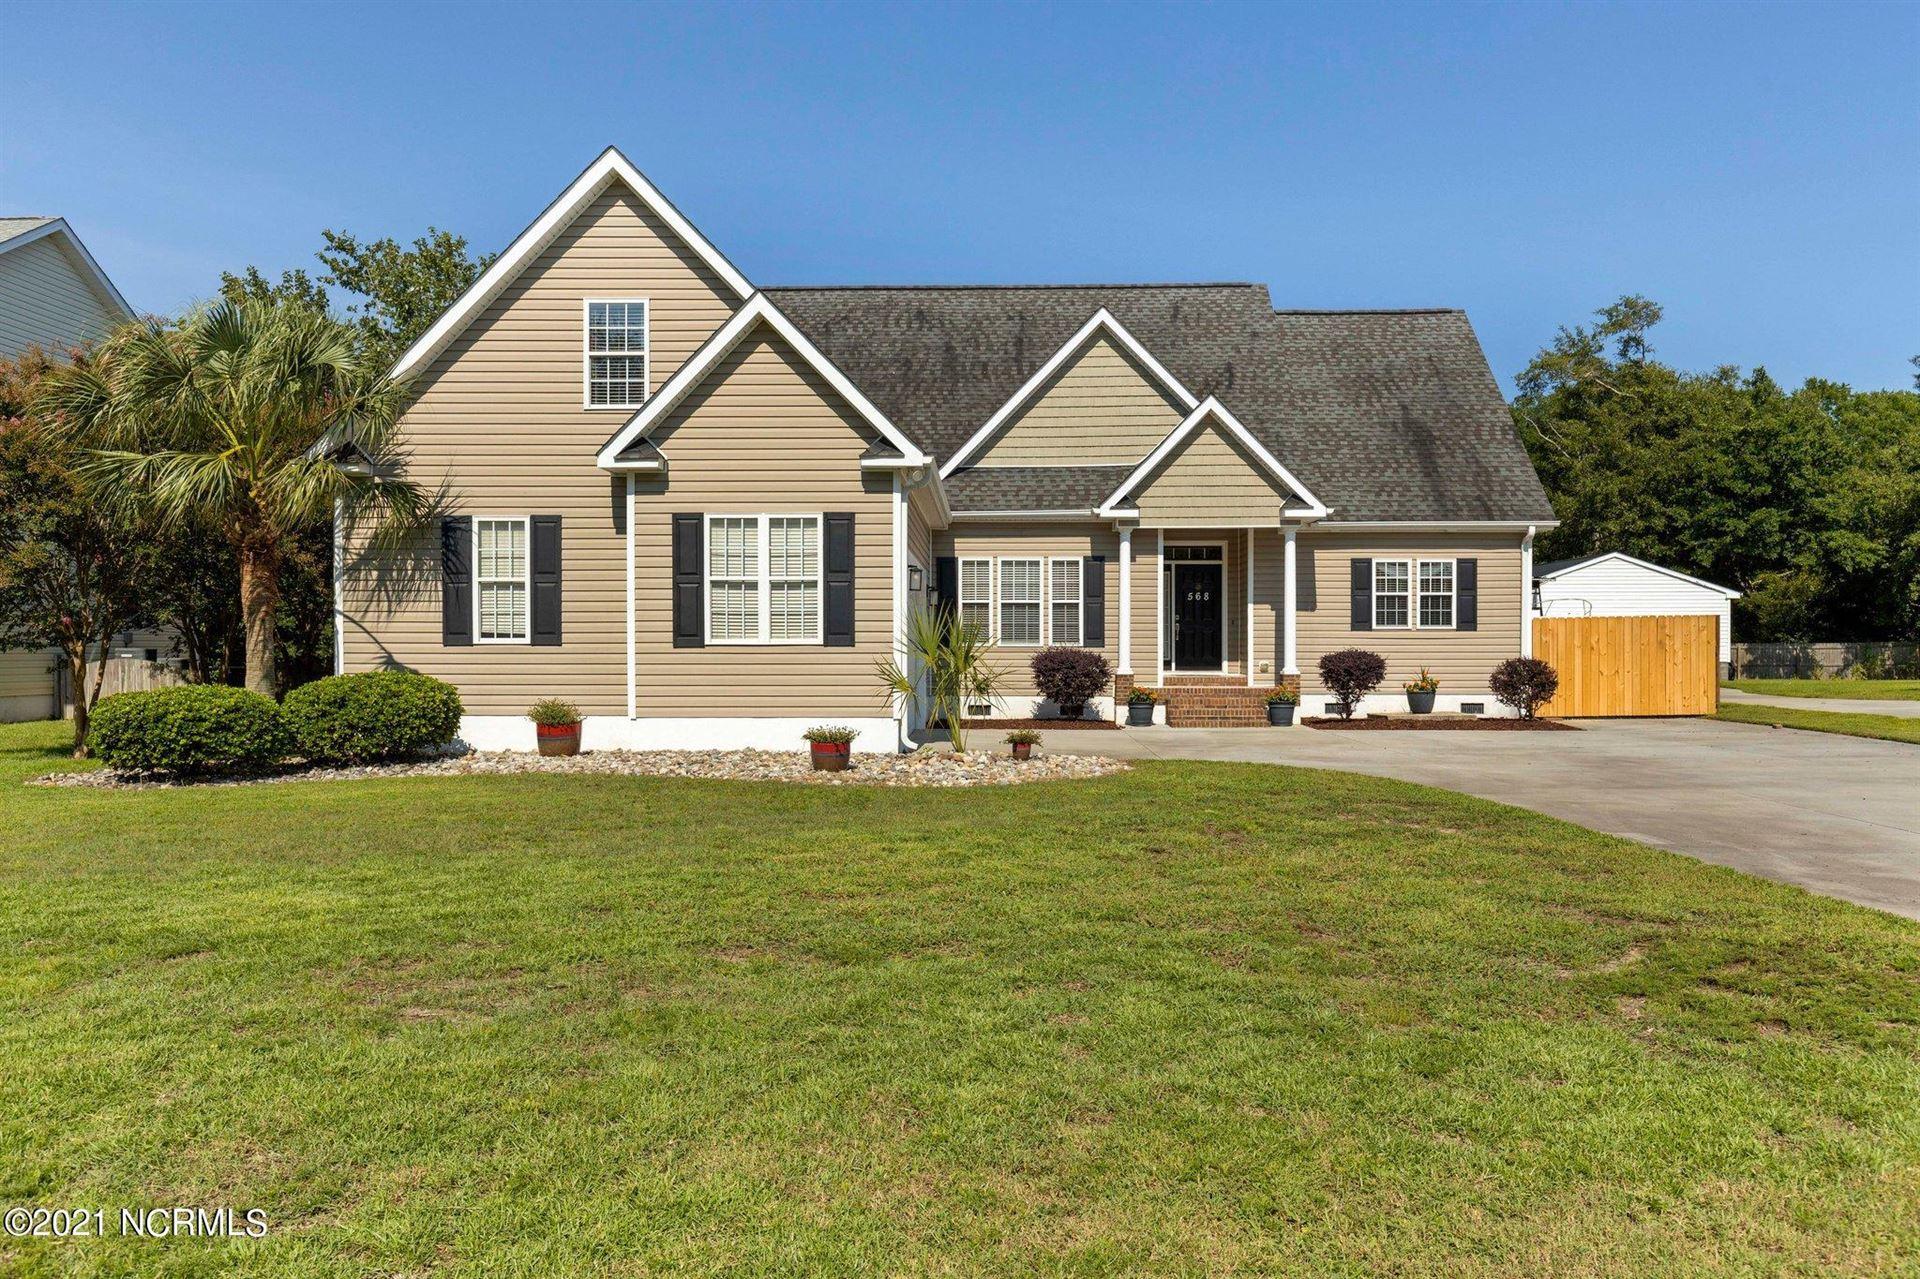 Photo of 568 Pearson Circle, Newport, NC 28570 (MLS # 100285828)